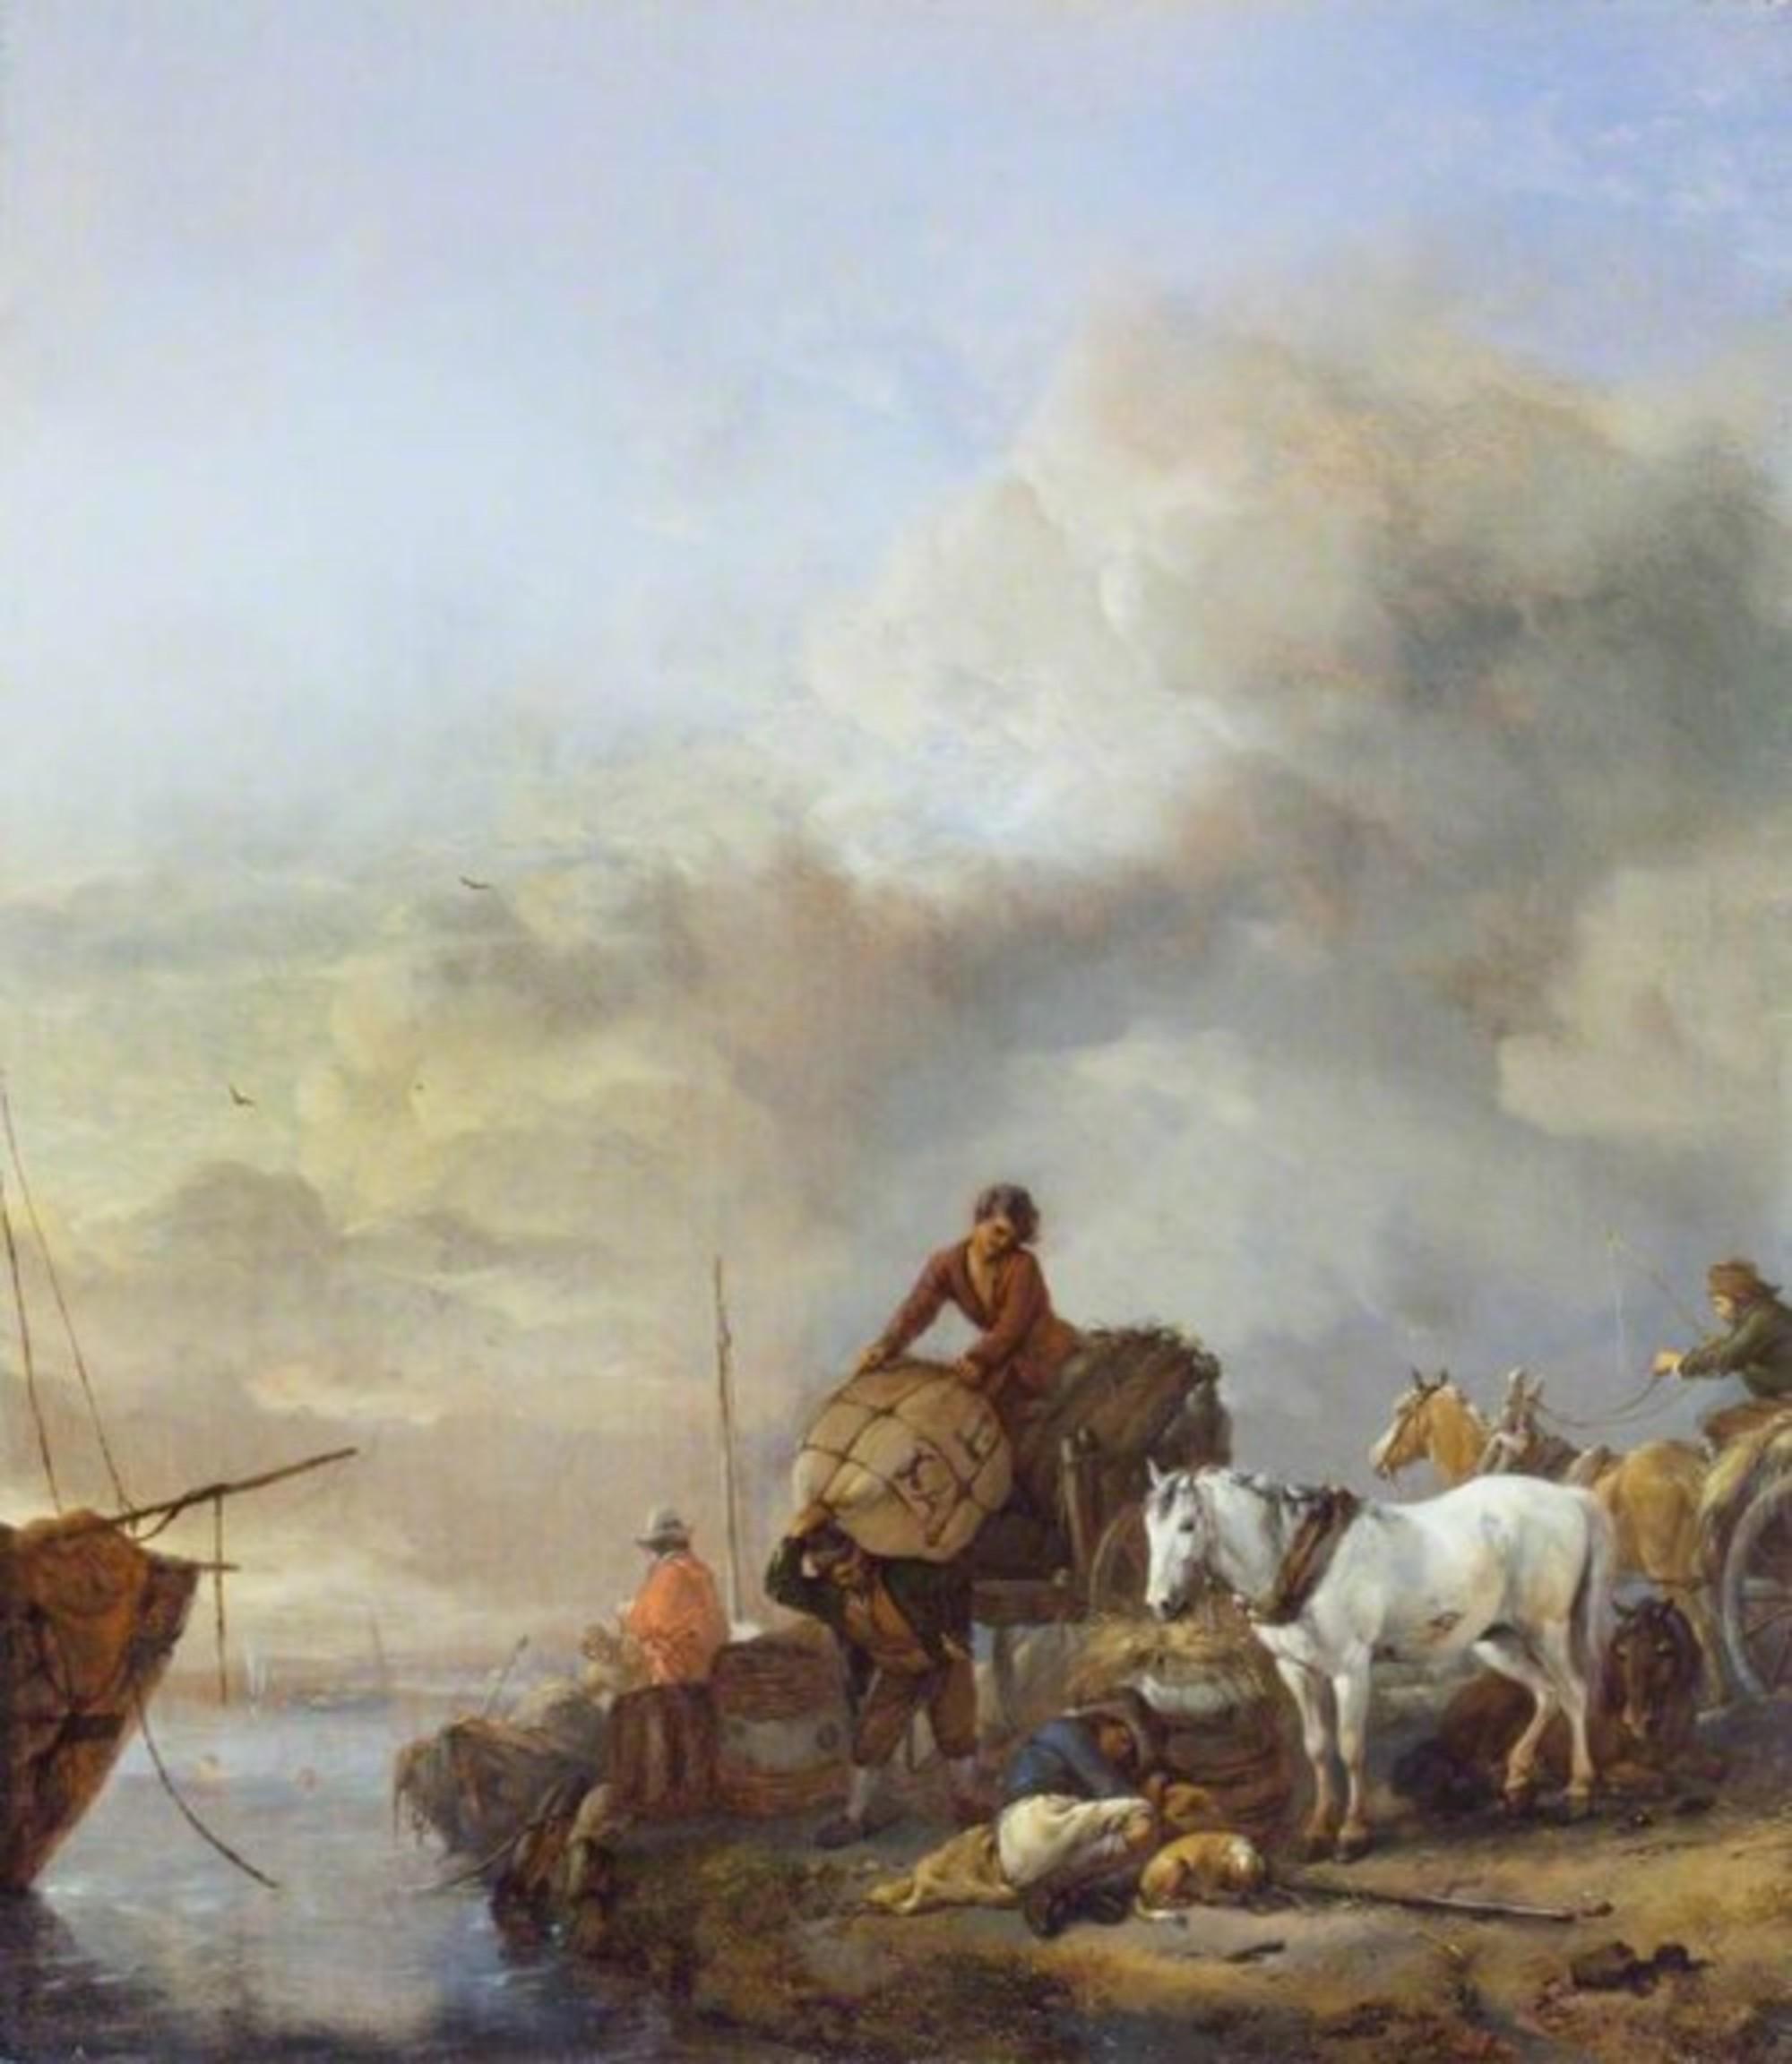 Philips-Wouwerman---Landing-a-Boat-WLC-WLC-P216.jpg